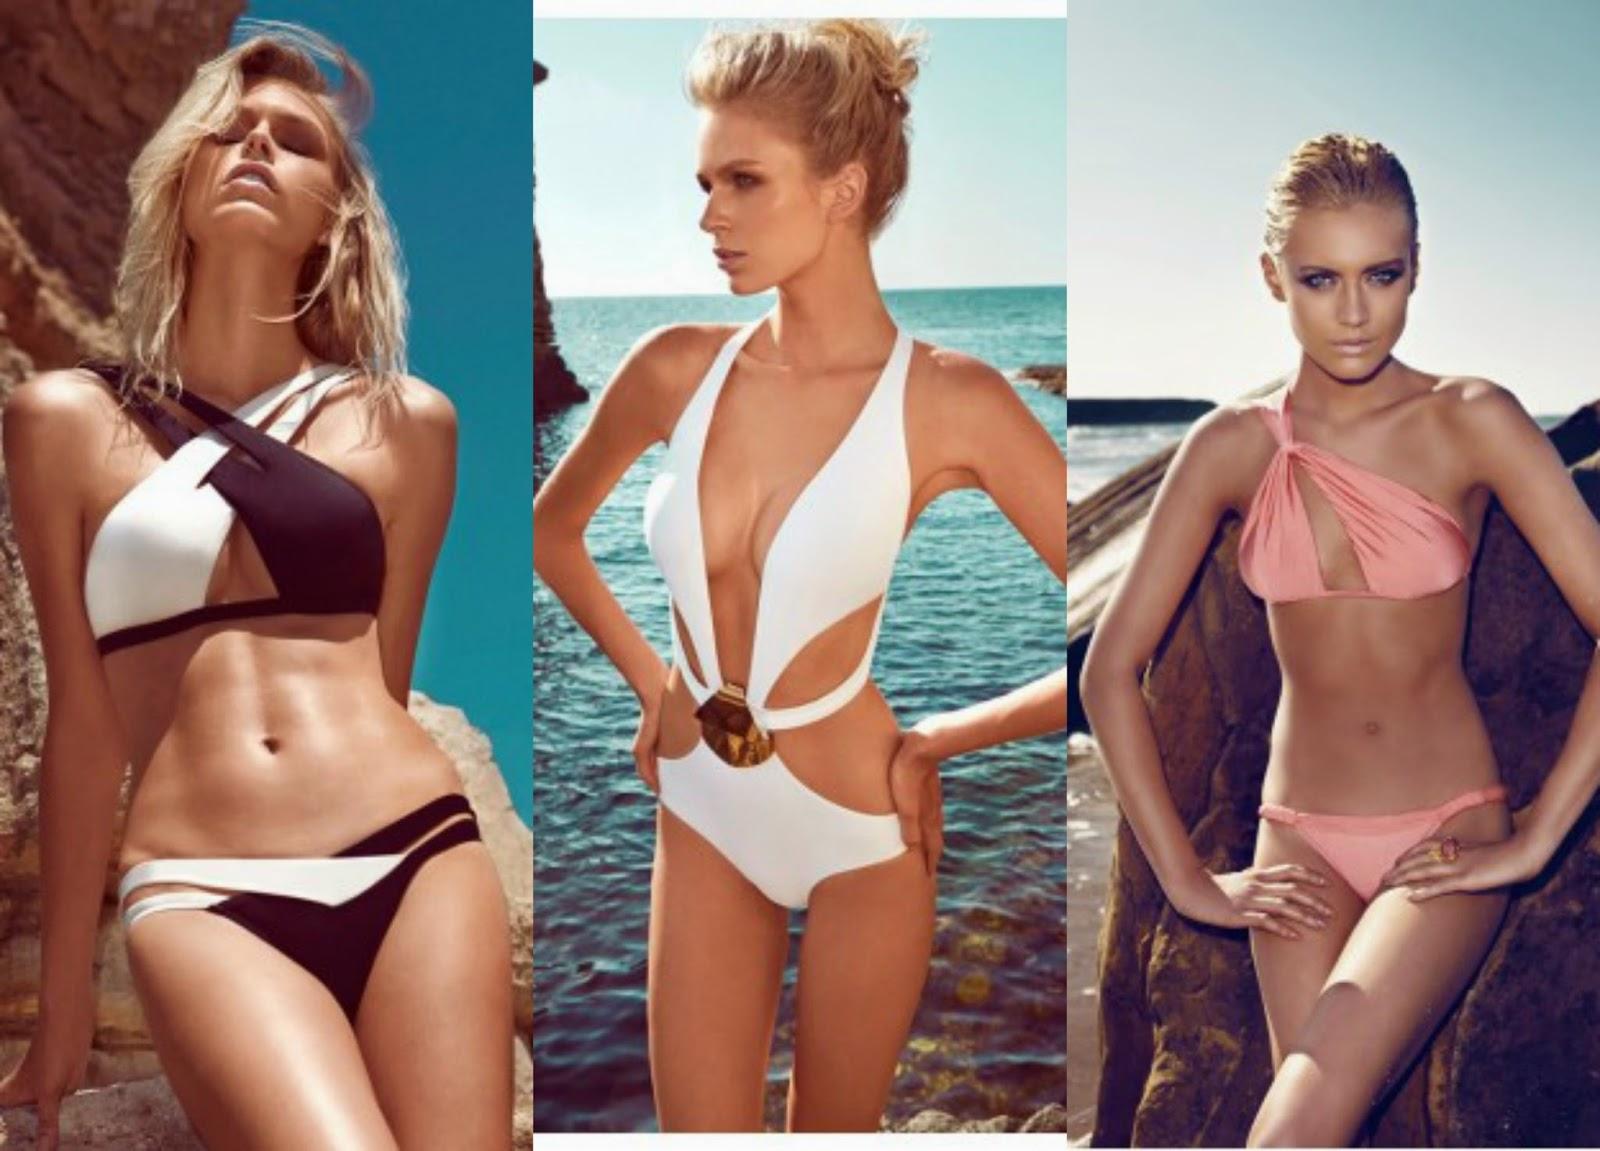 http://www.syriouslyinfashion.com/2014/05/moeva-super-sexy-swimwear-for-ladies.html